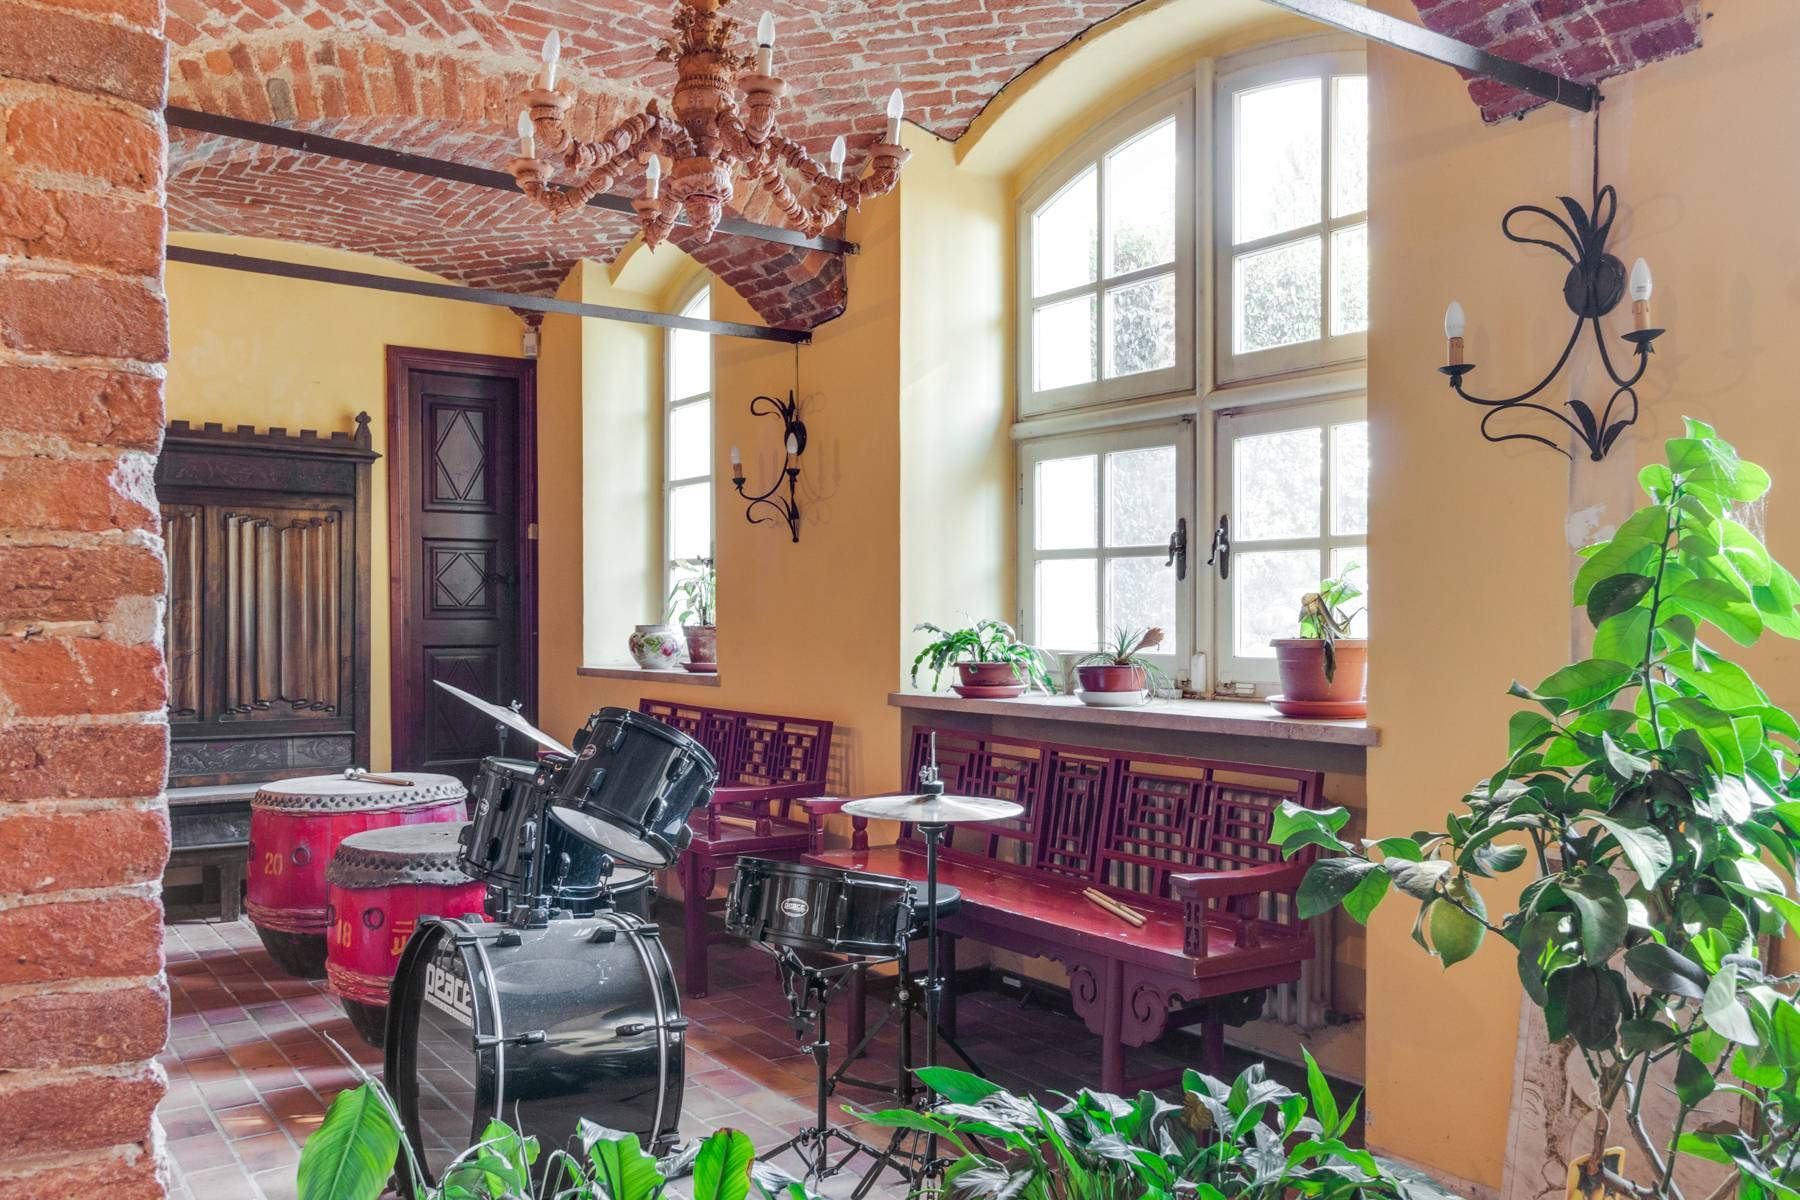 Villa in Vendita a Pino Torinese: 5 locali, 2087 mq - Foto 18